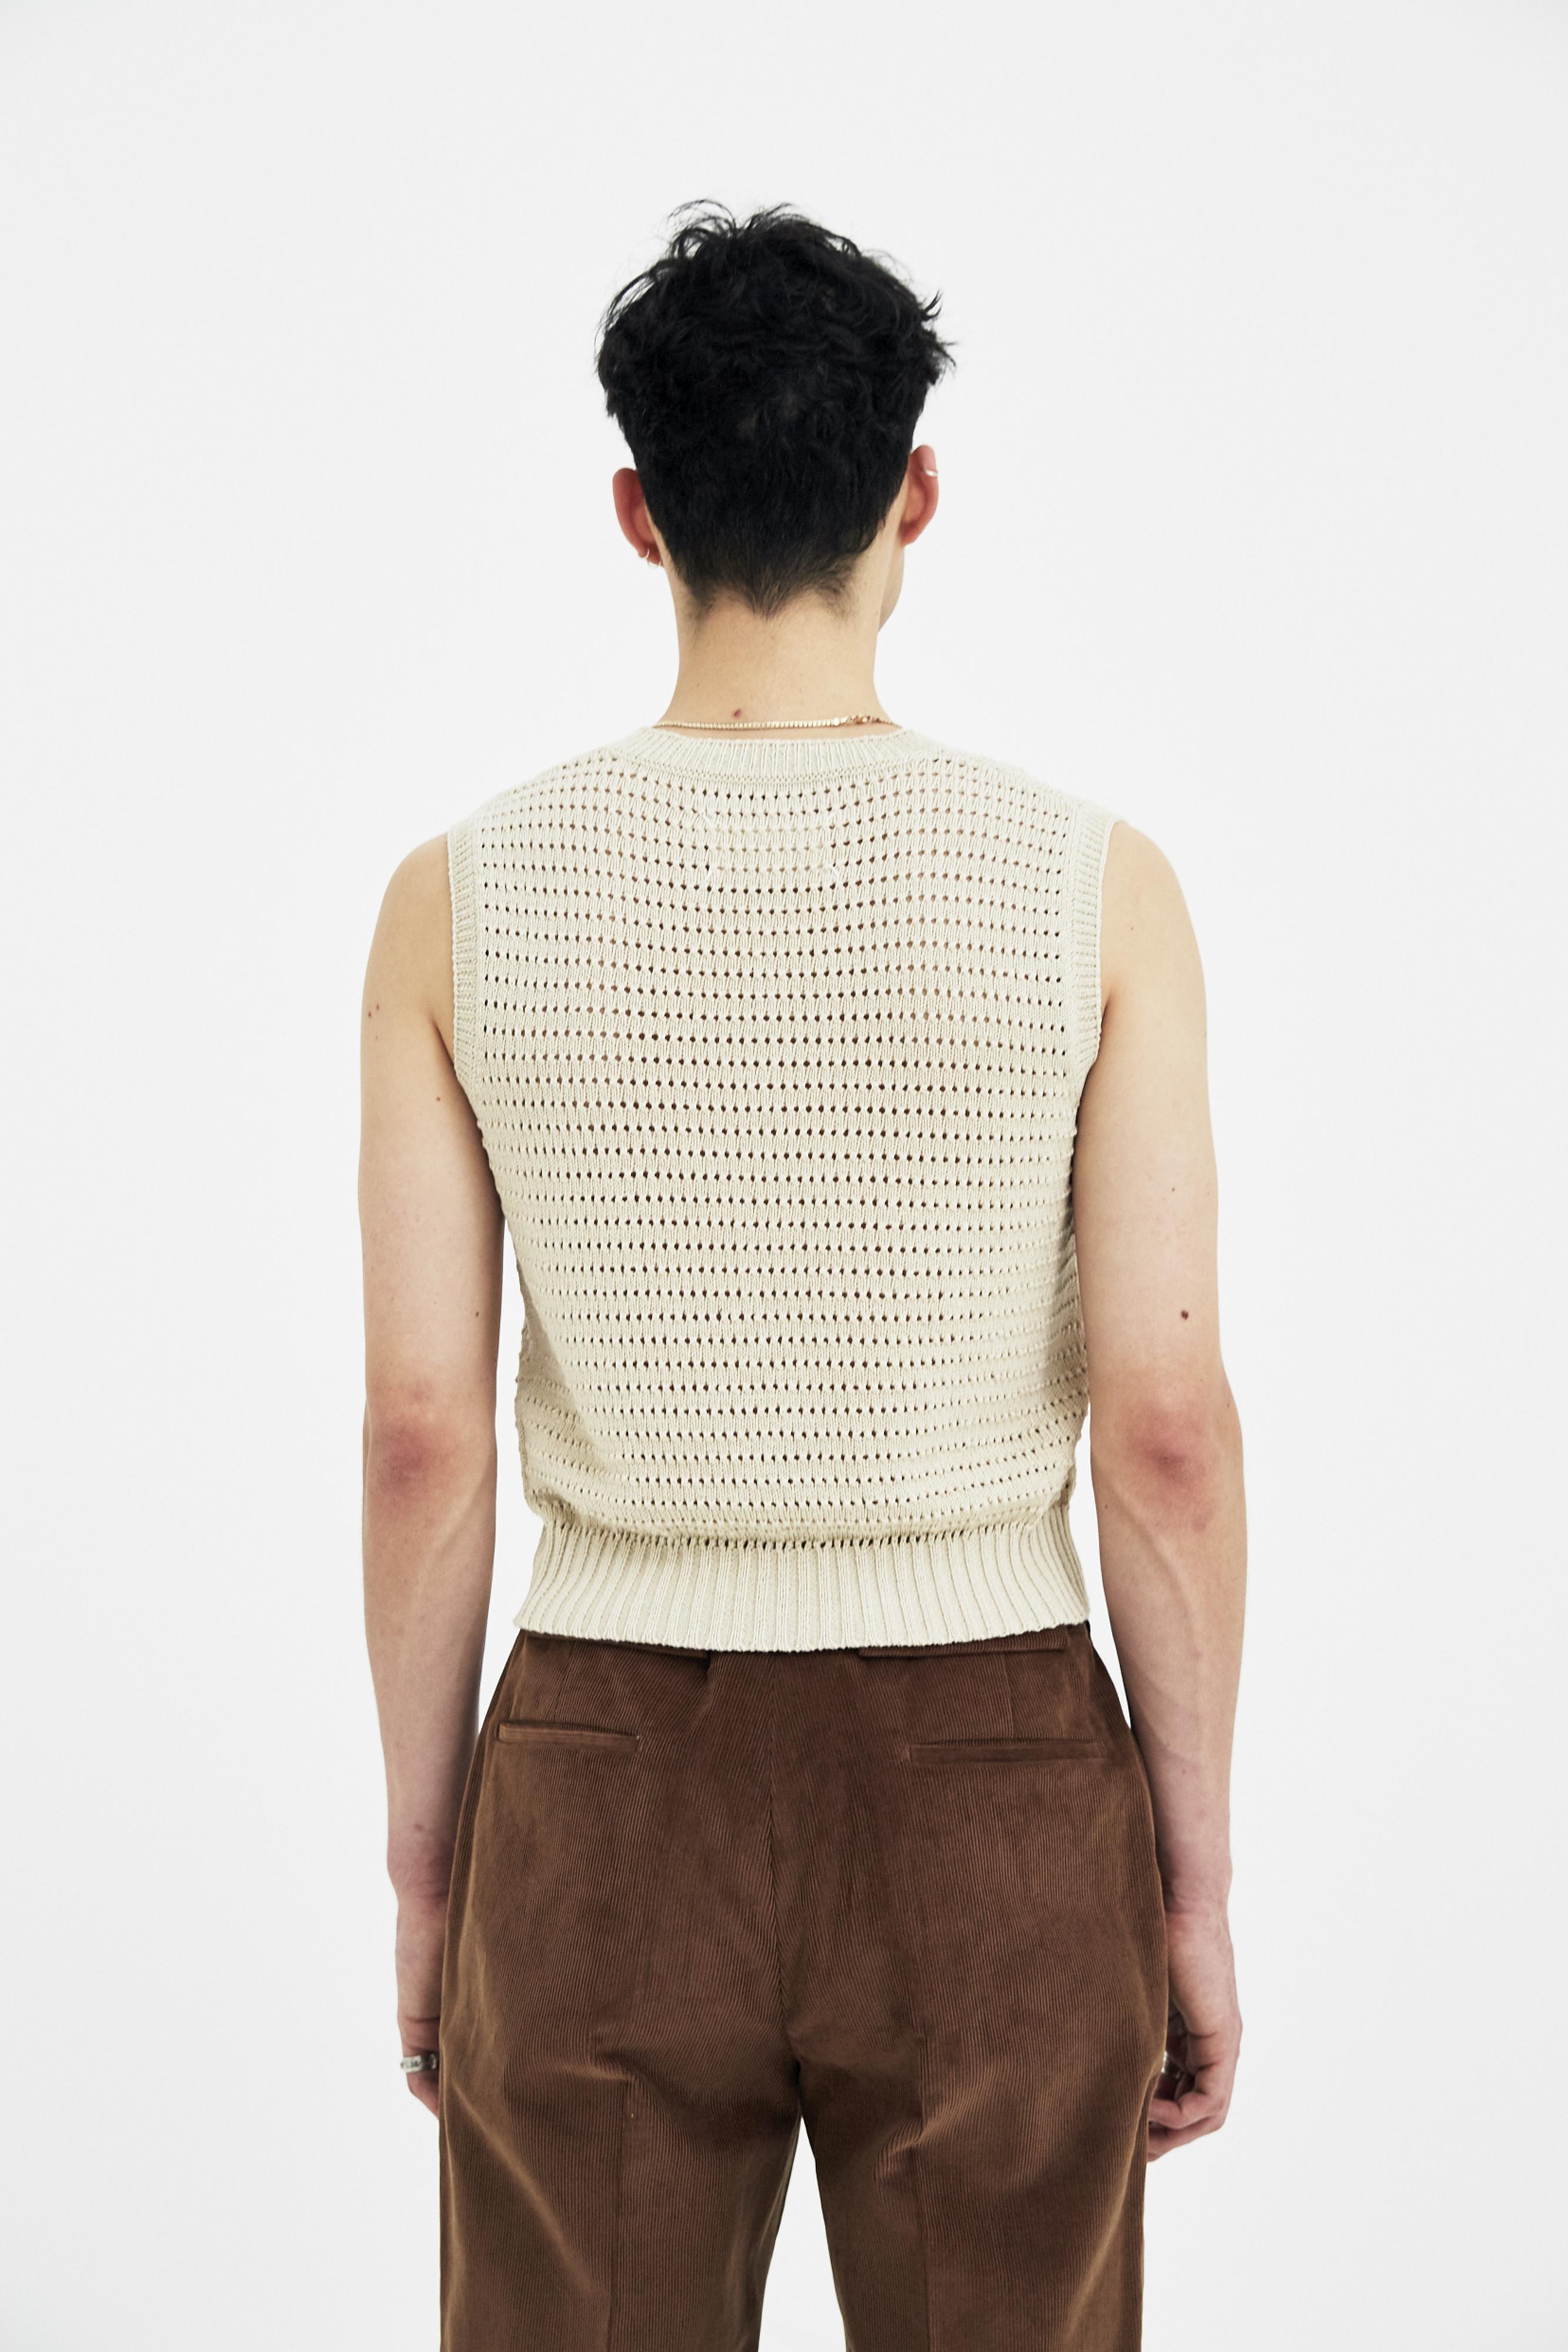 Maison margiela Light Beige Sweater Vest in Natural for Men | Lyst